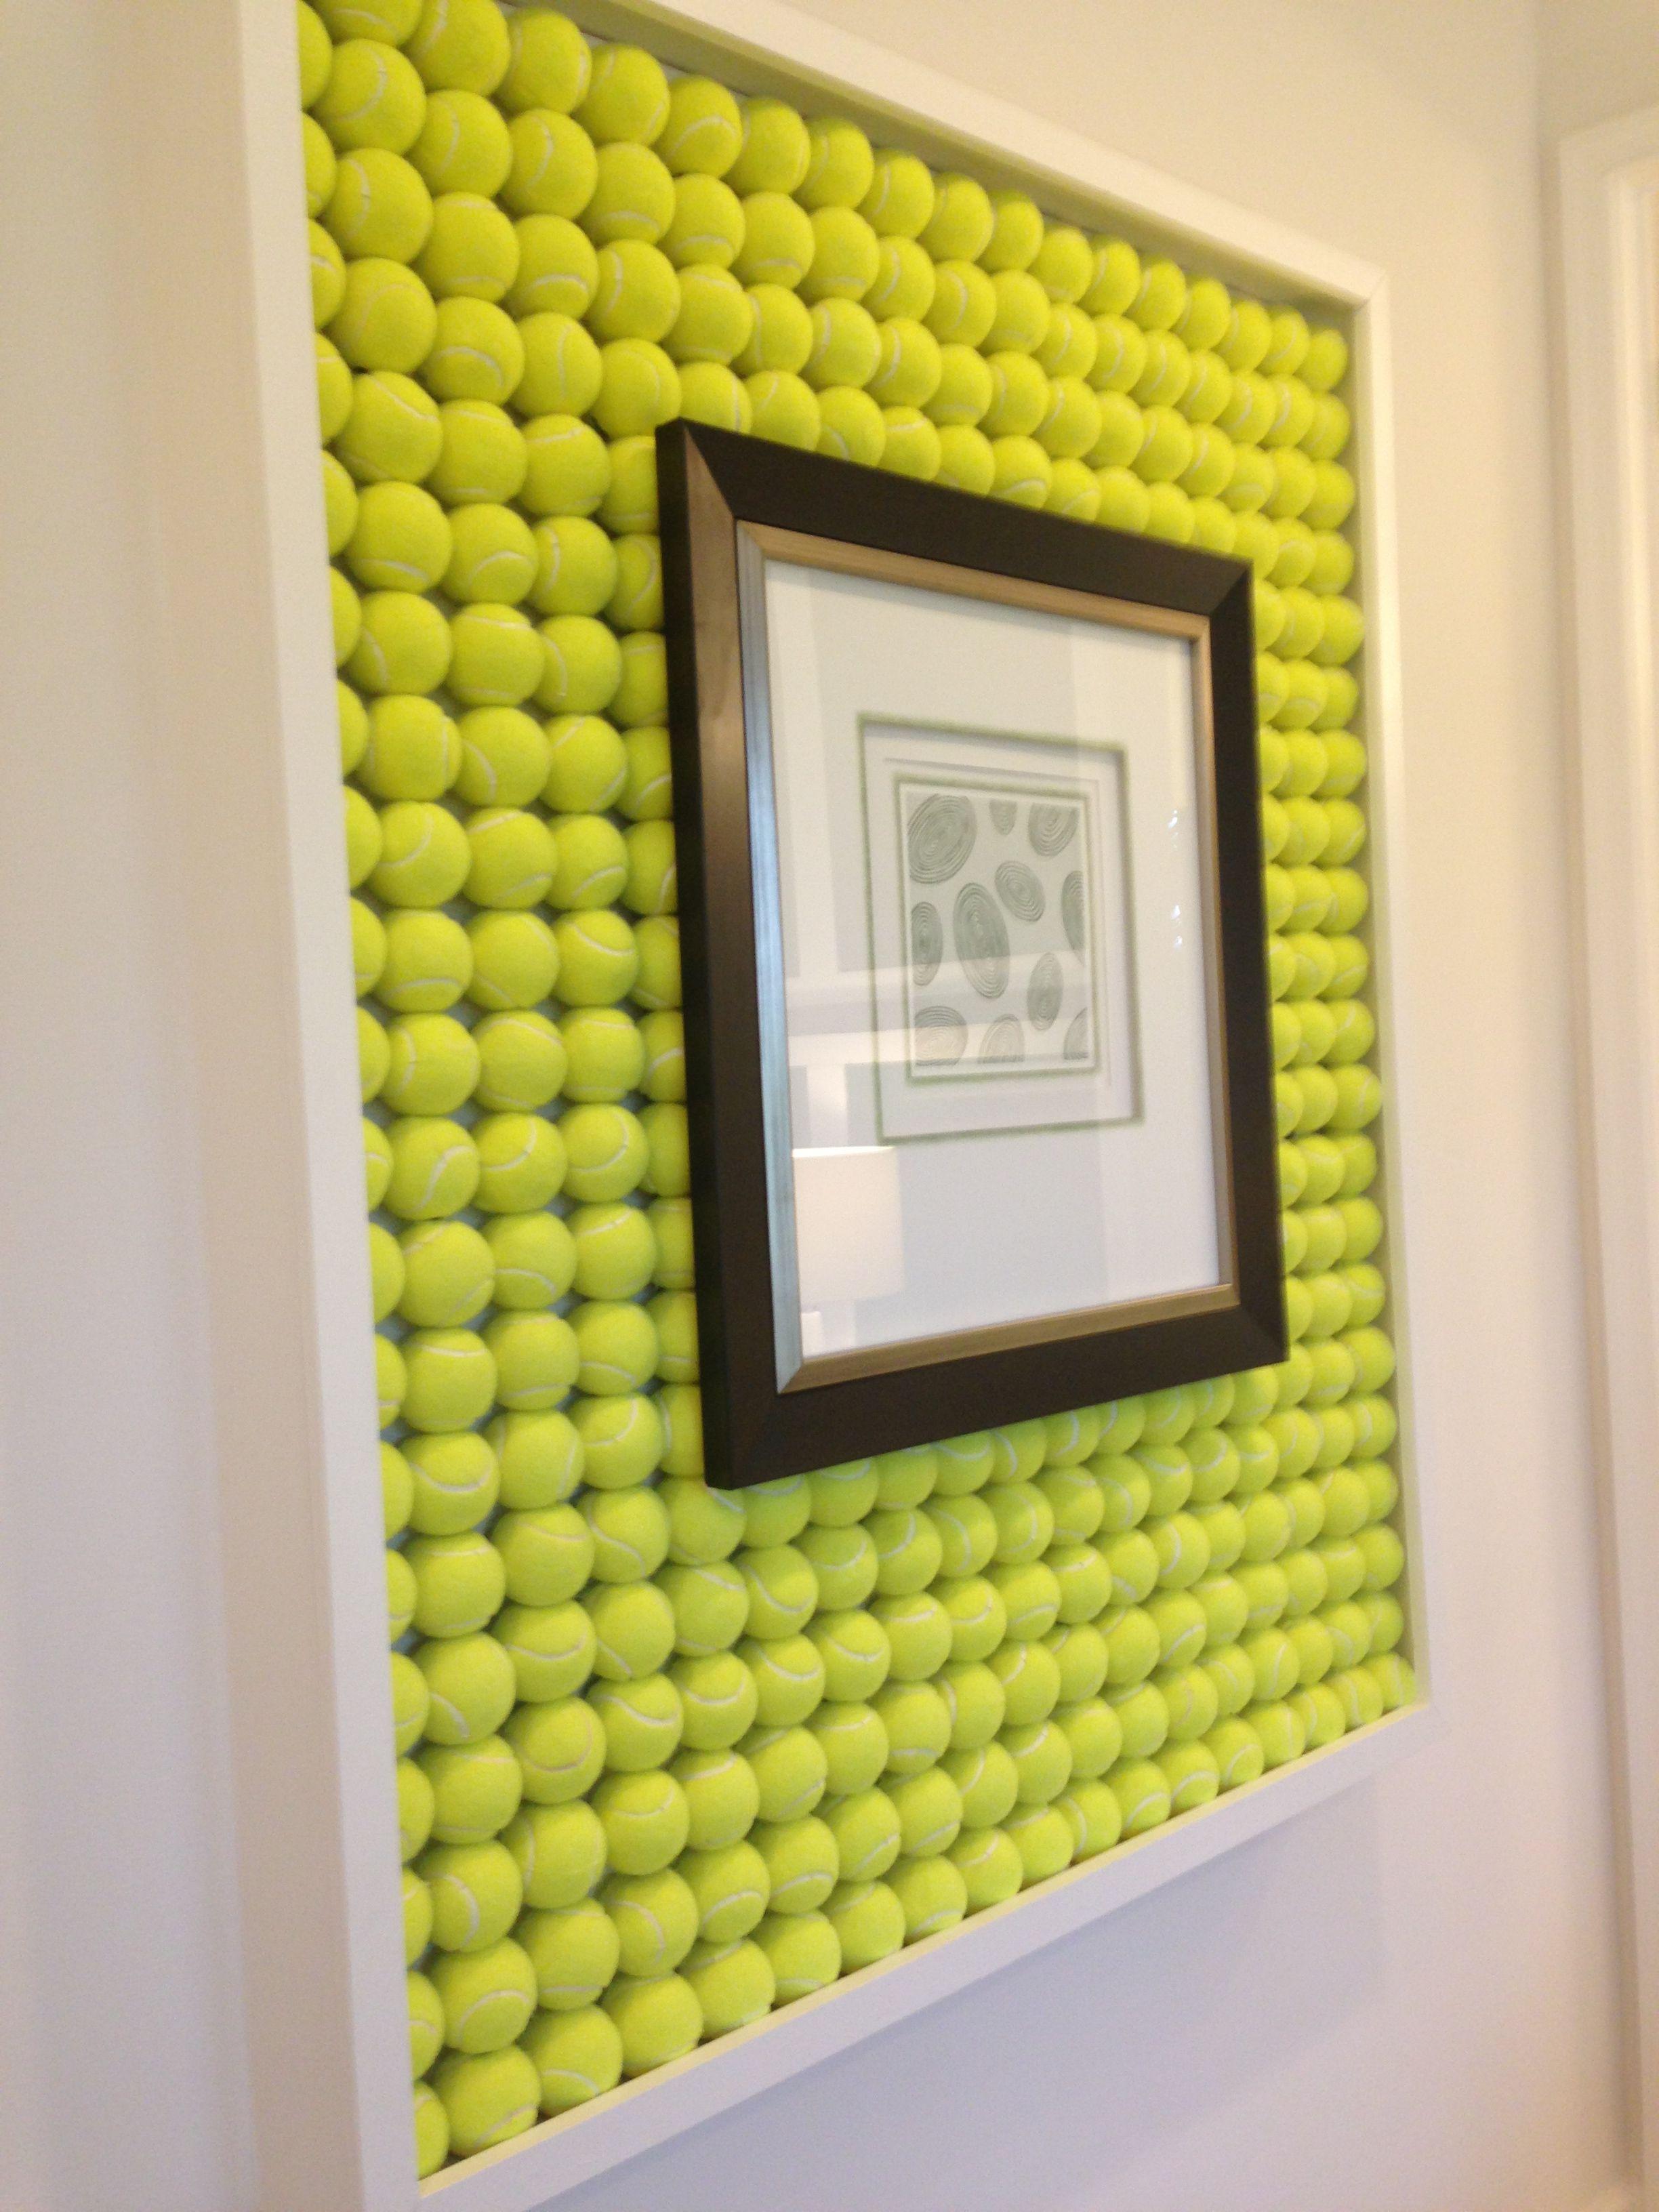 DIY picture frame made of tennis balls Tennis gifts diy